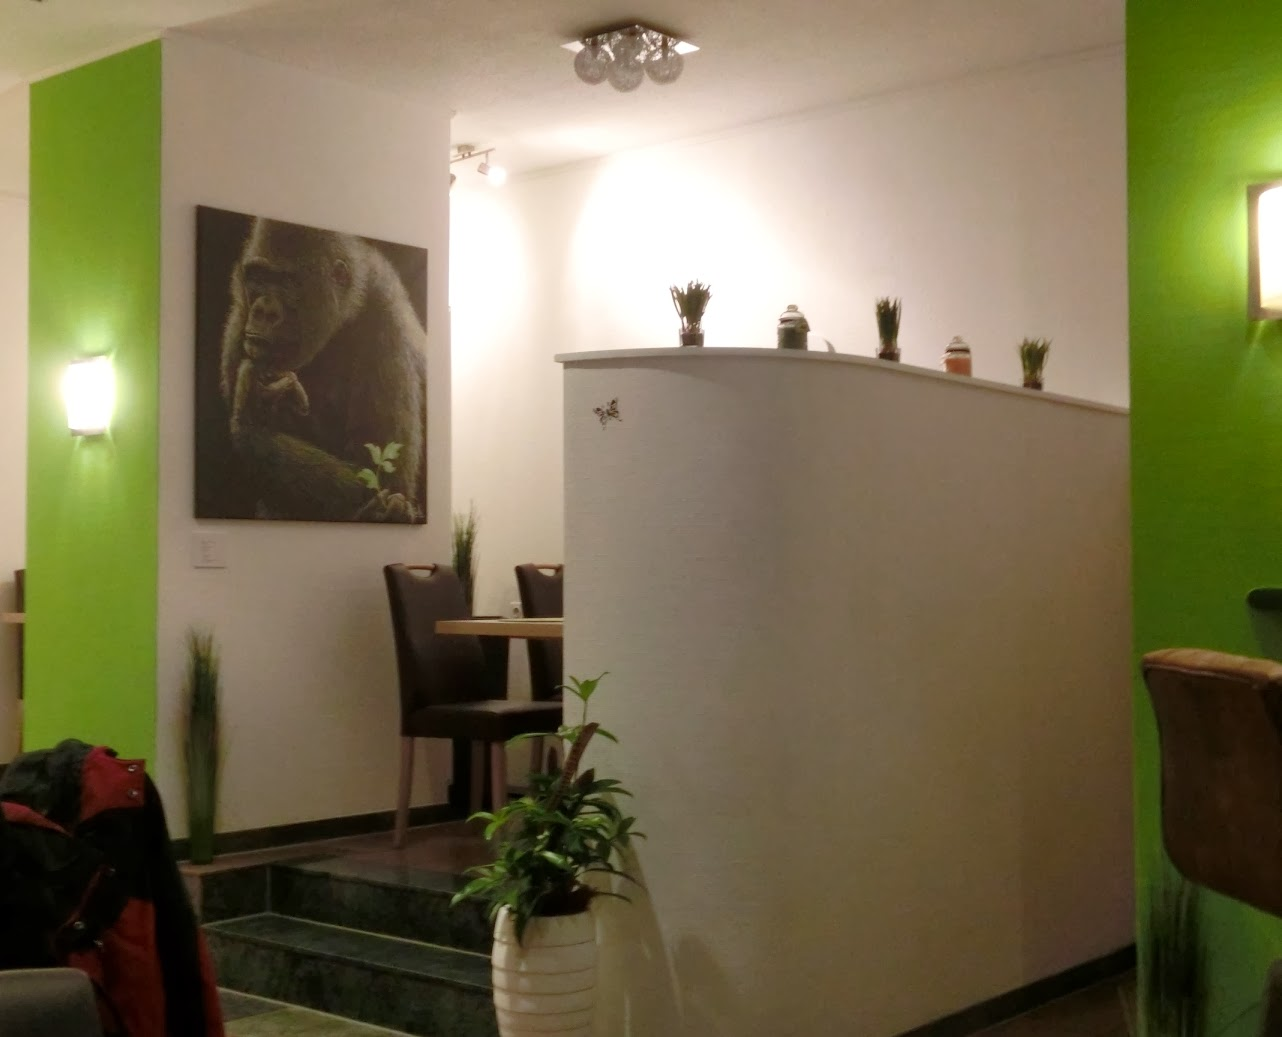 bhakti yoginis blog das vegane restaurant in n rnberg hat geschlossen. Black Bedroom Furniture Sets. Home Design Ideas